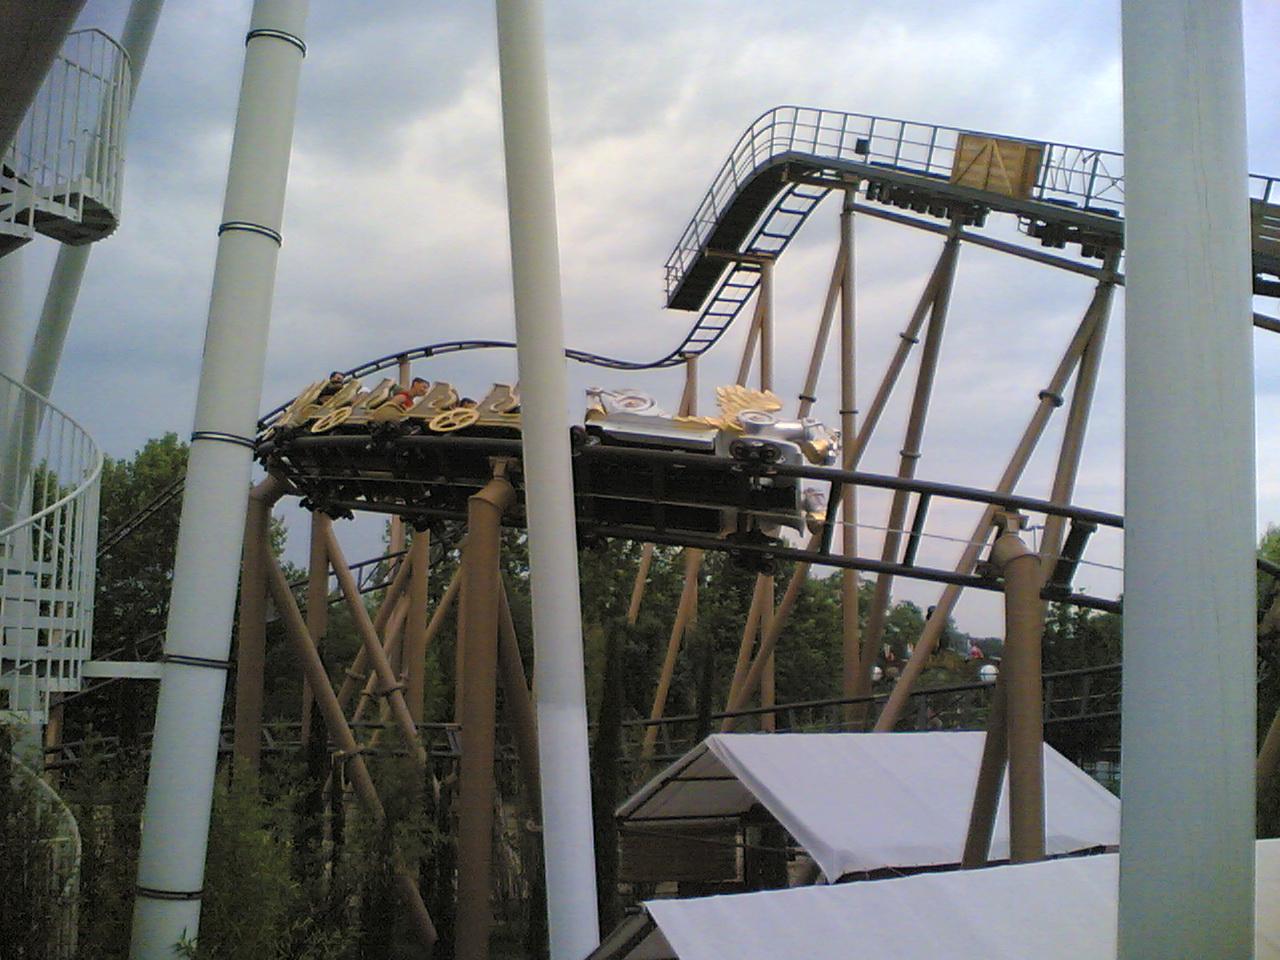 Pegasus_europapark.jpg